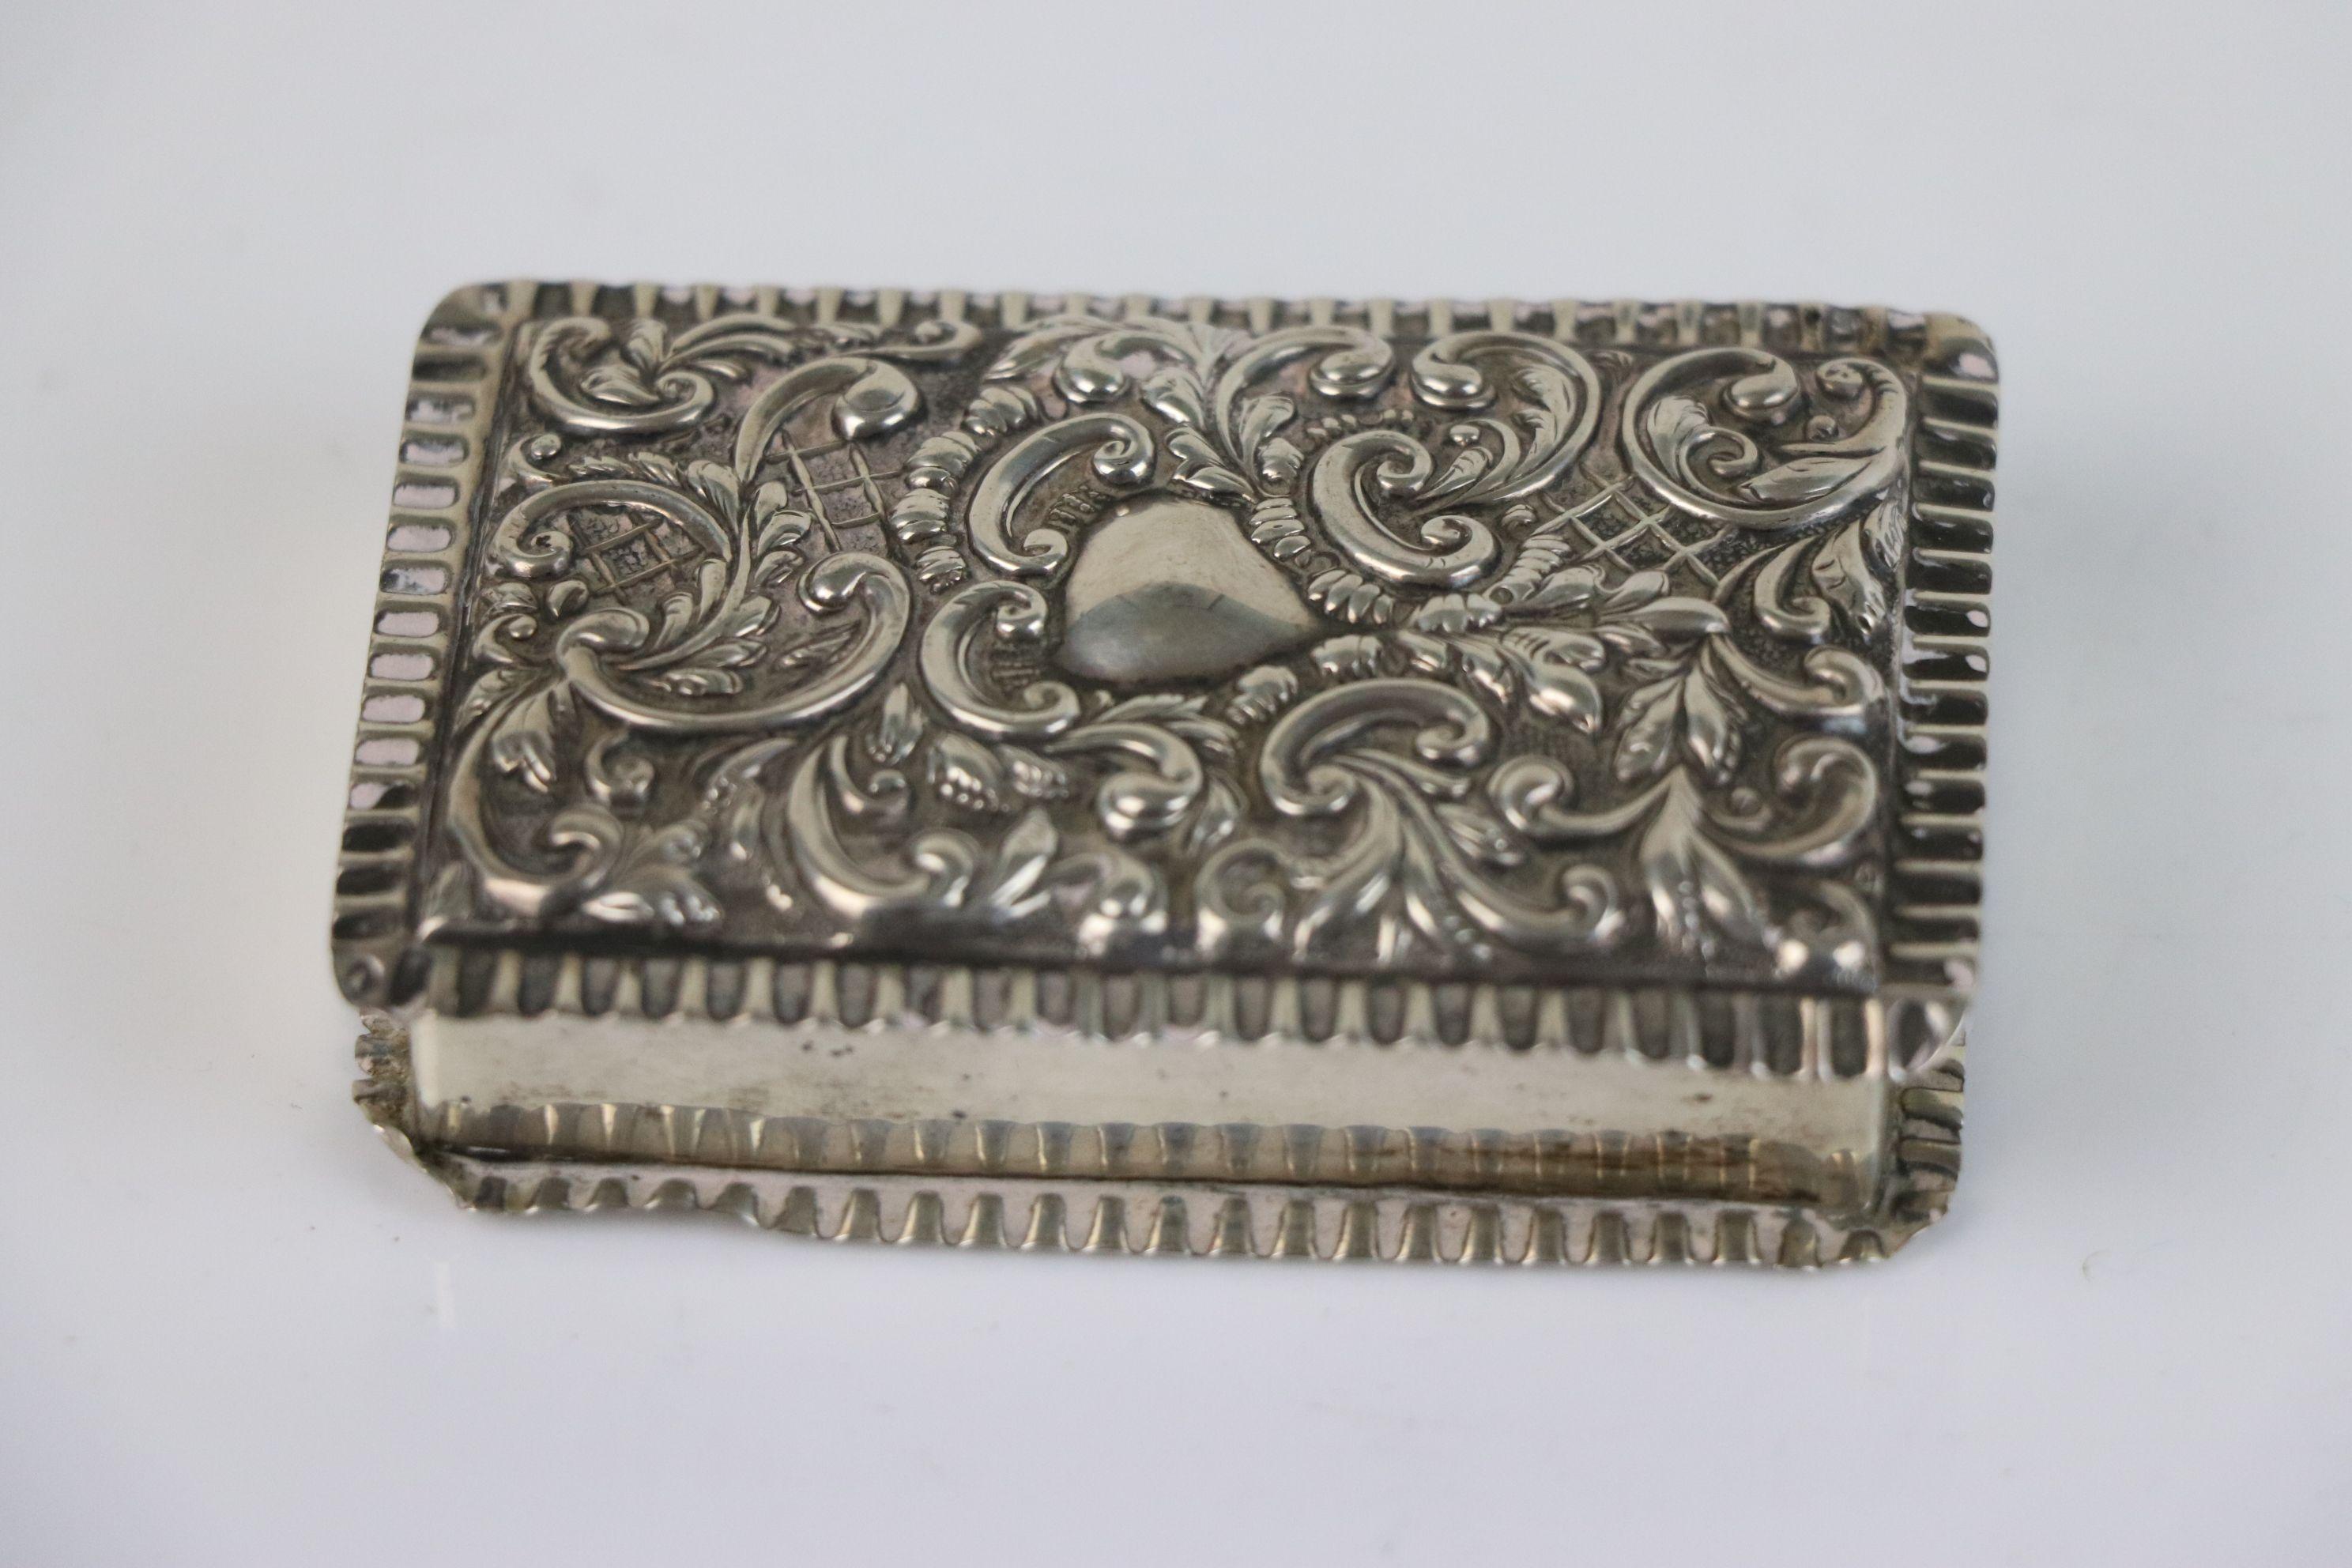 A fully hallmarked sterling silver snuff box, maker marked for Adie & Lovekin Ltd, assay marked